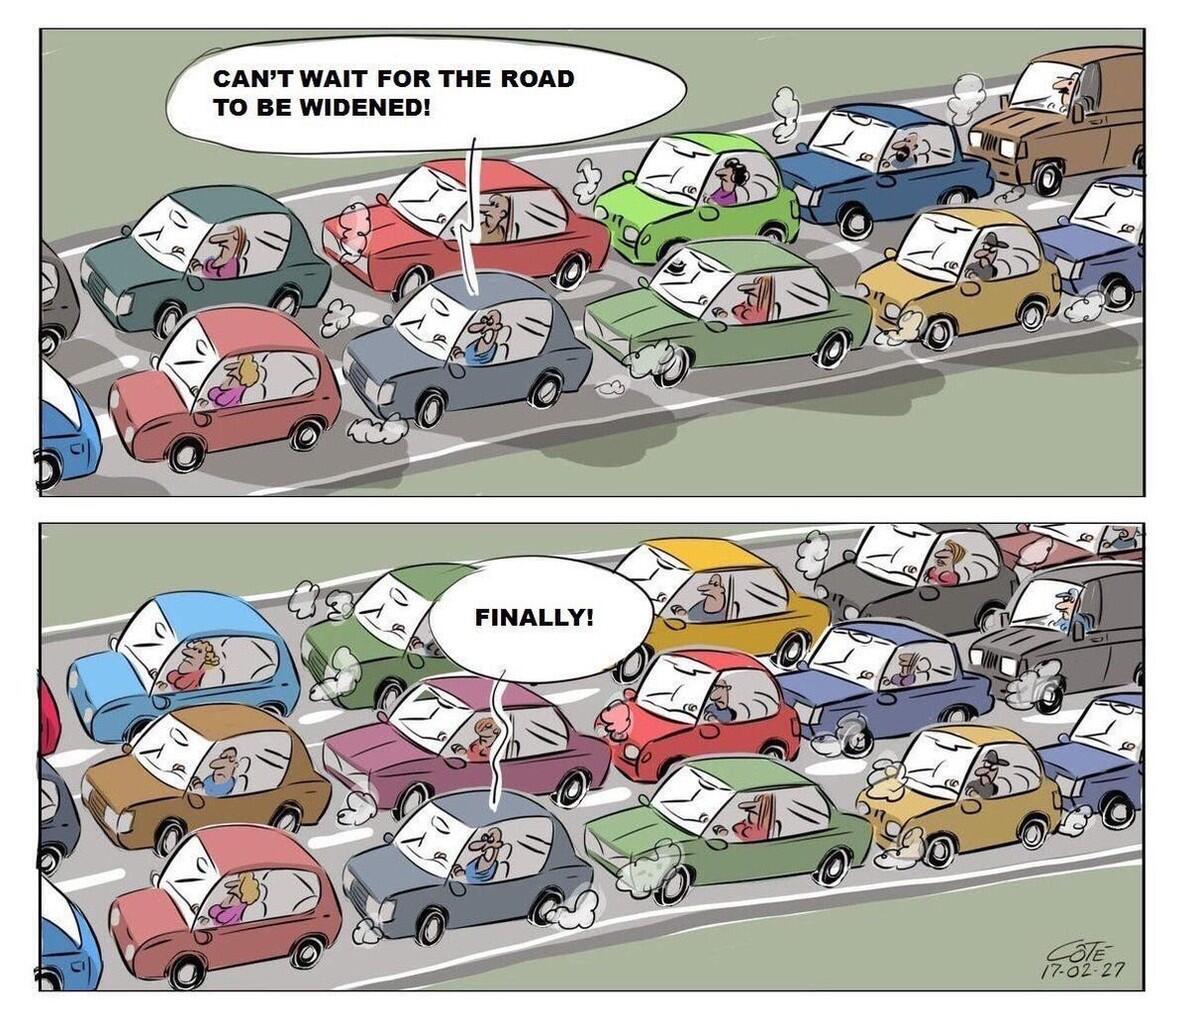 Perlukah Sepeda Motor sbg Angkutan Umum diatur dalam UU?